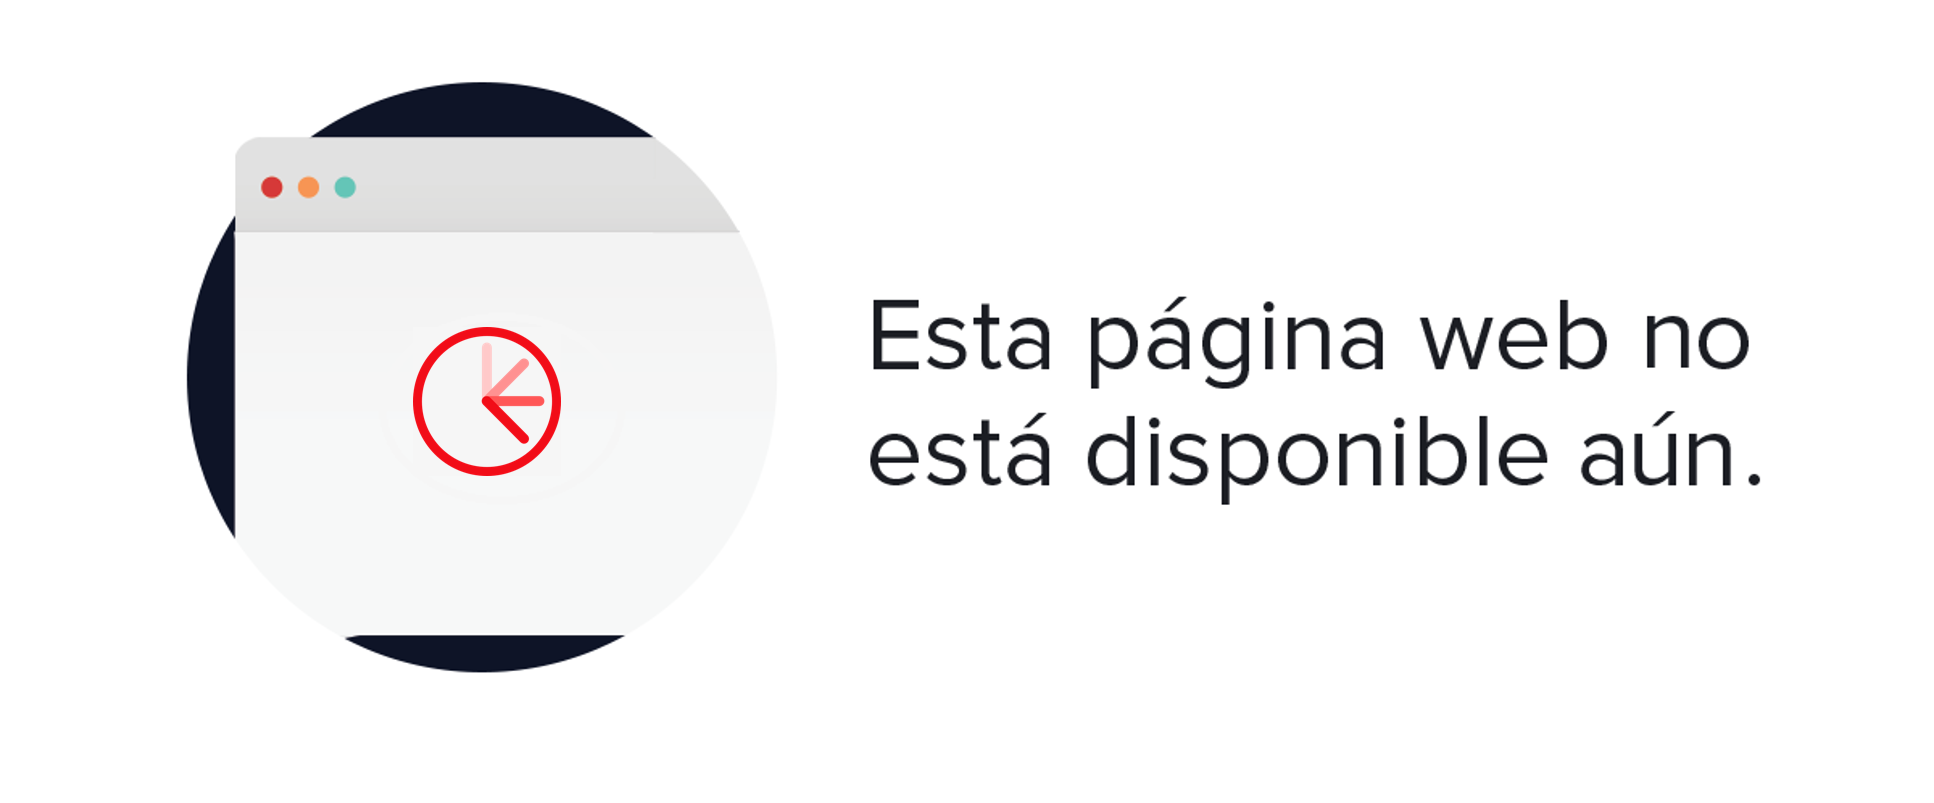 ingles aleman: